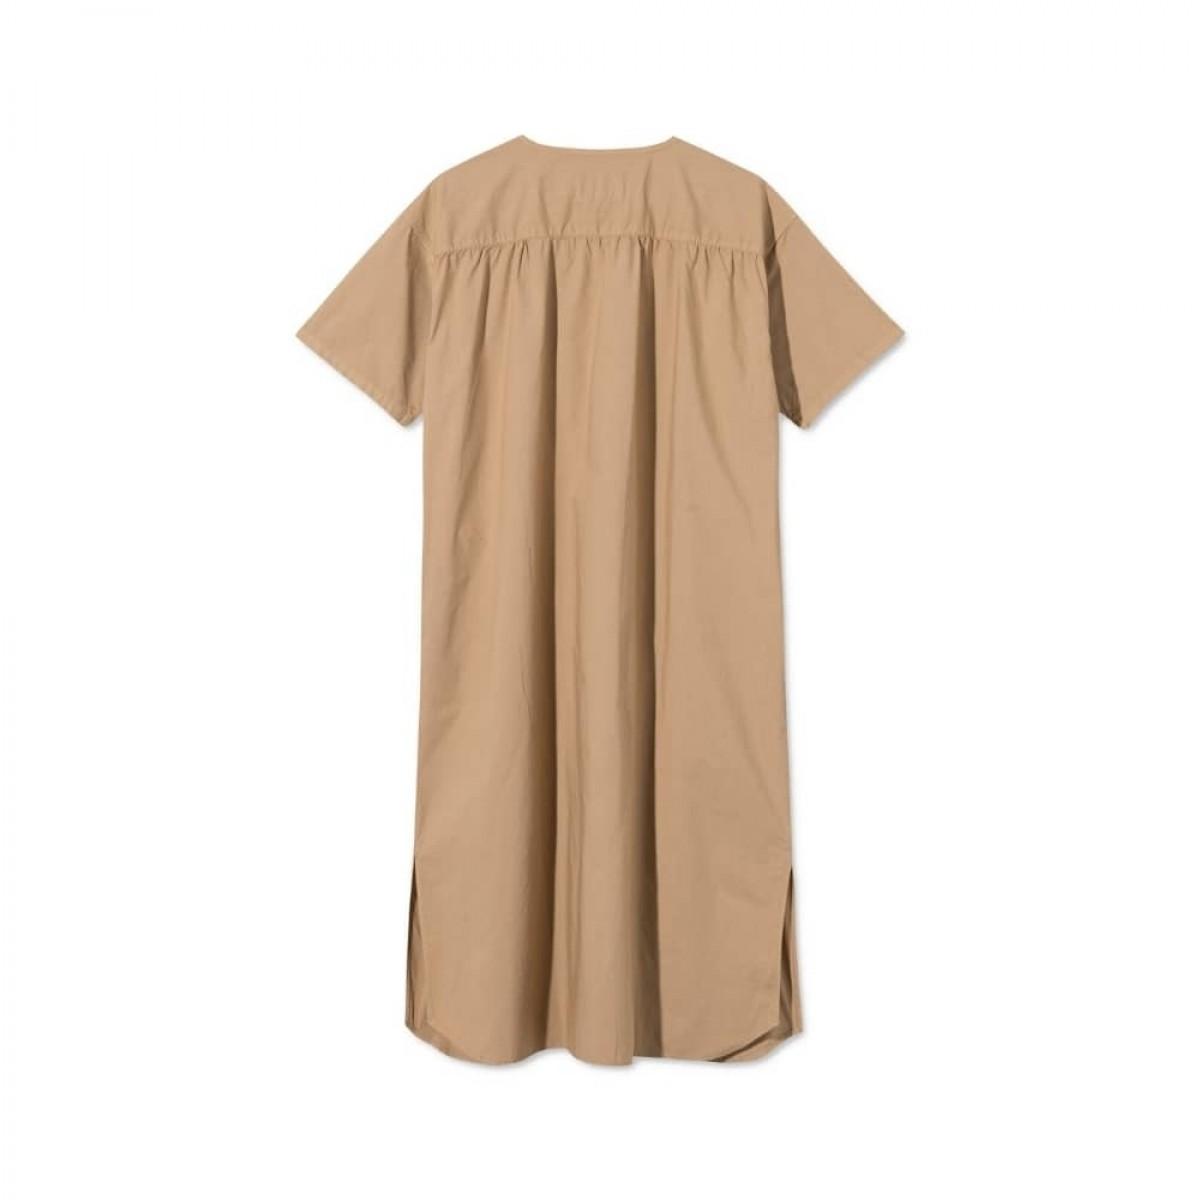 deluna kjole - light brown - ryg